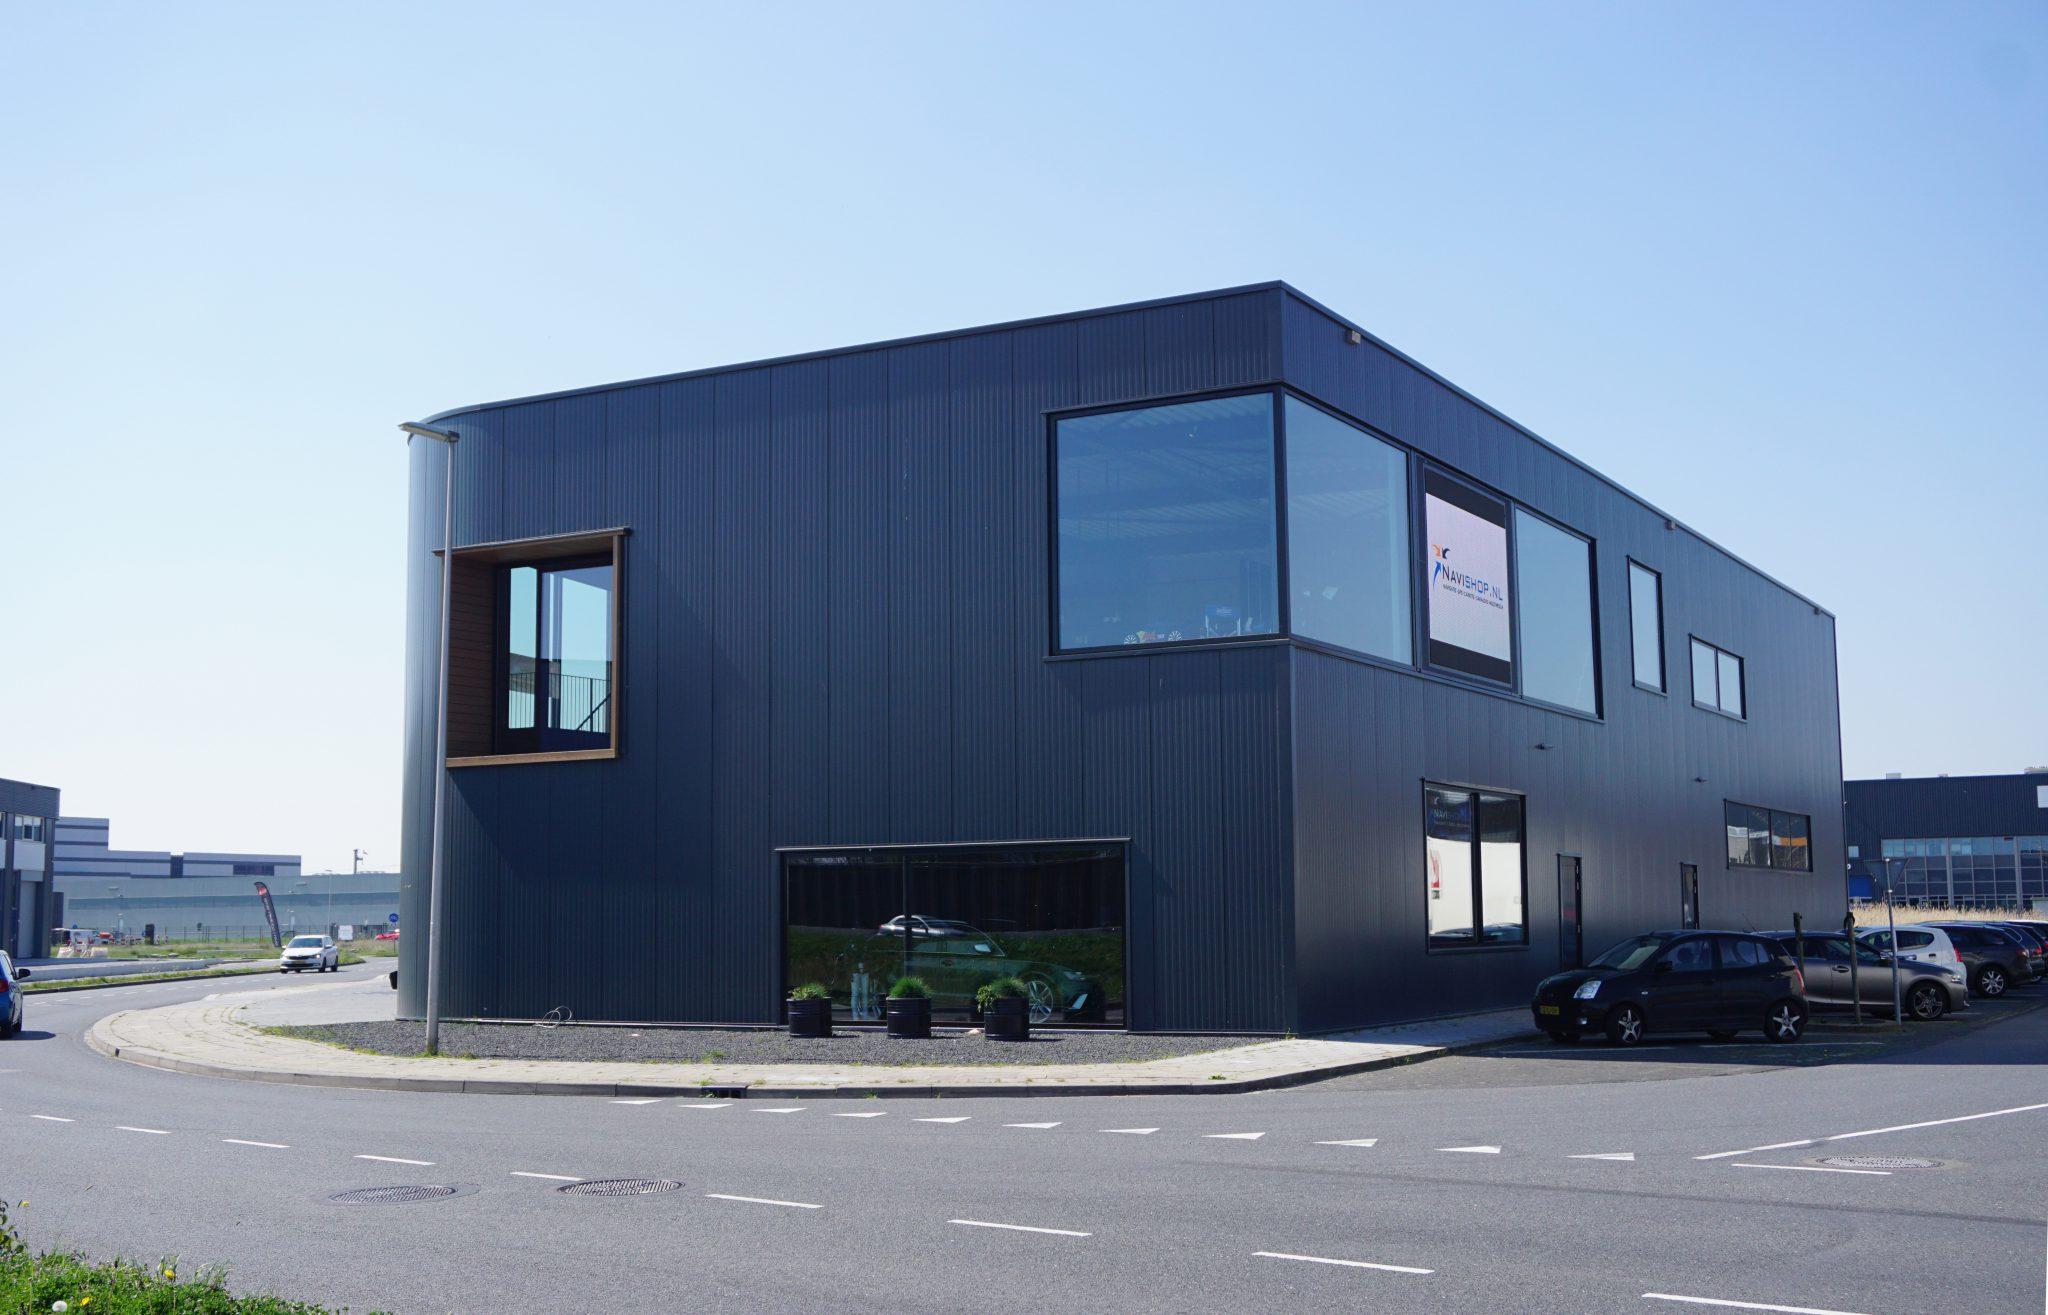 architect Studio Bruce